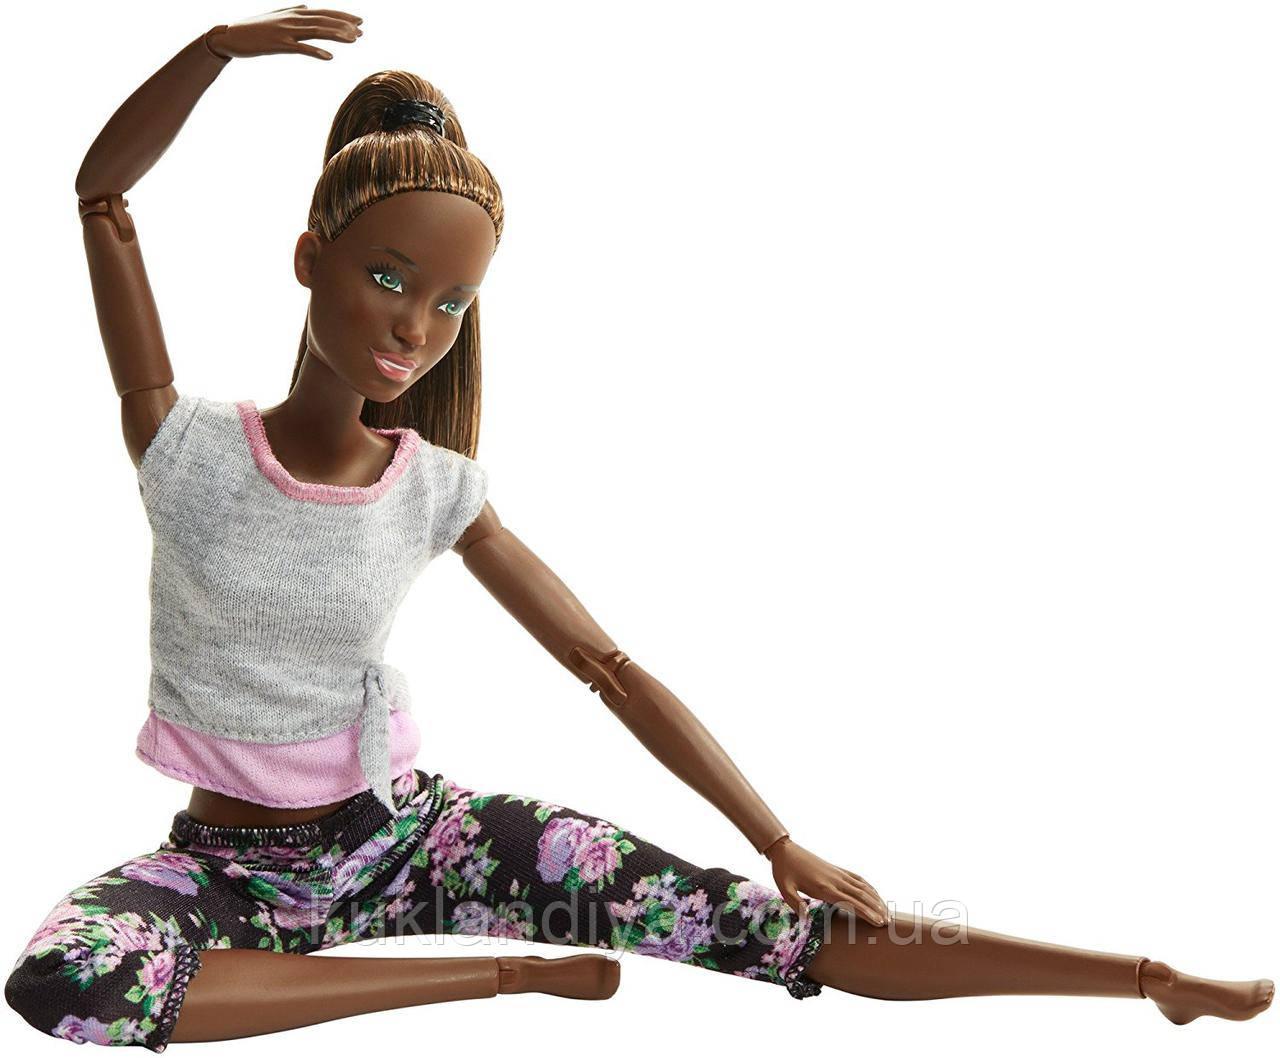 Кукла Барби Йога Безграничные движения афроамериканка - Barbie Made to Move